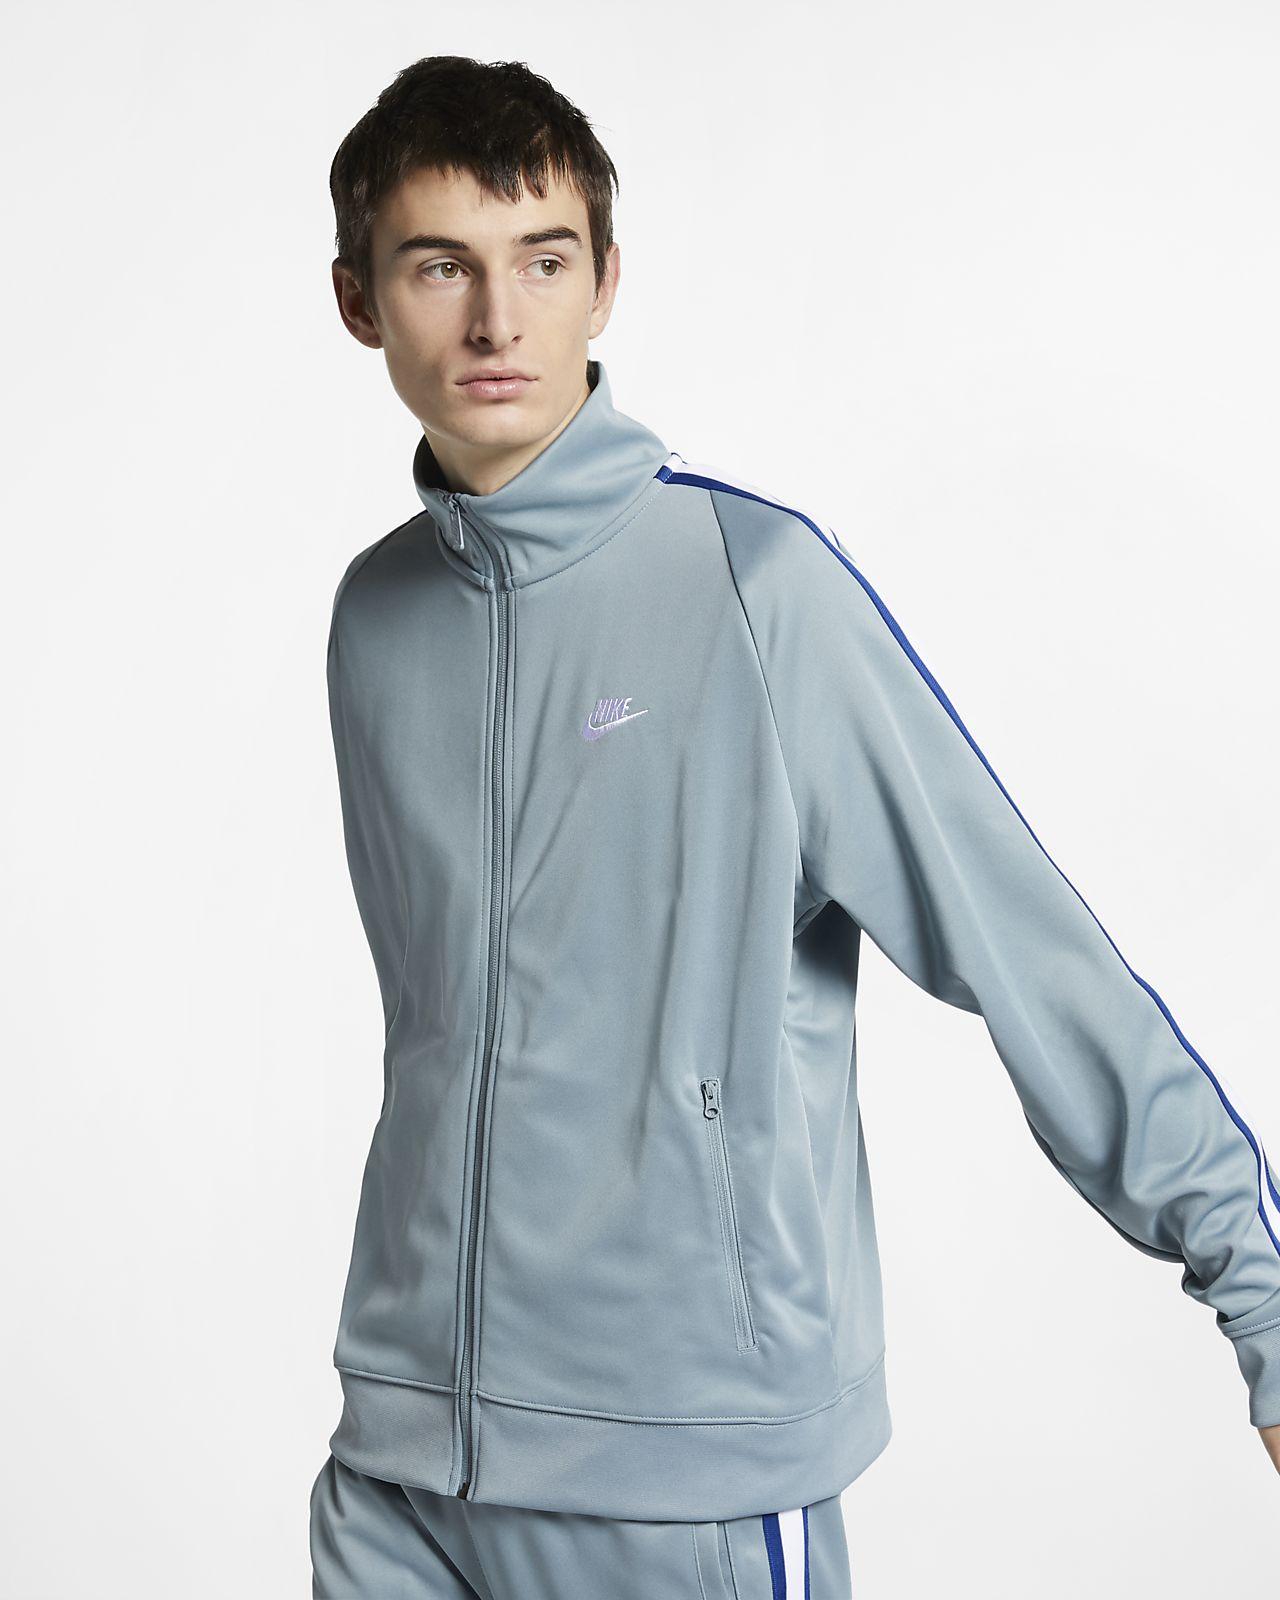 2a3875079 Nike Sportswear N98 Knit Warm-Up Jacket - SPORTING GOODS Sports Hoodies |  Sweatshirts - Superfanas.lt